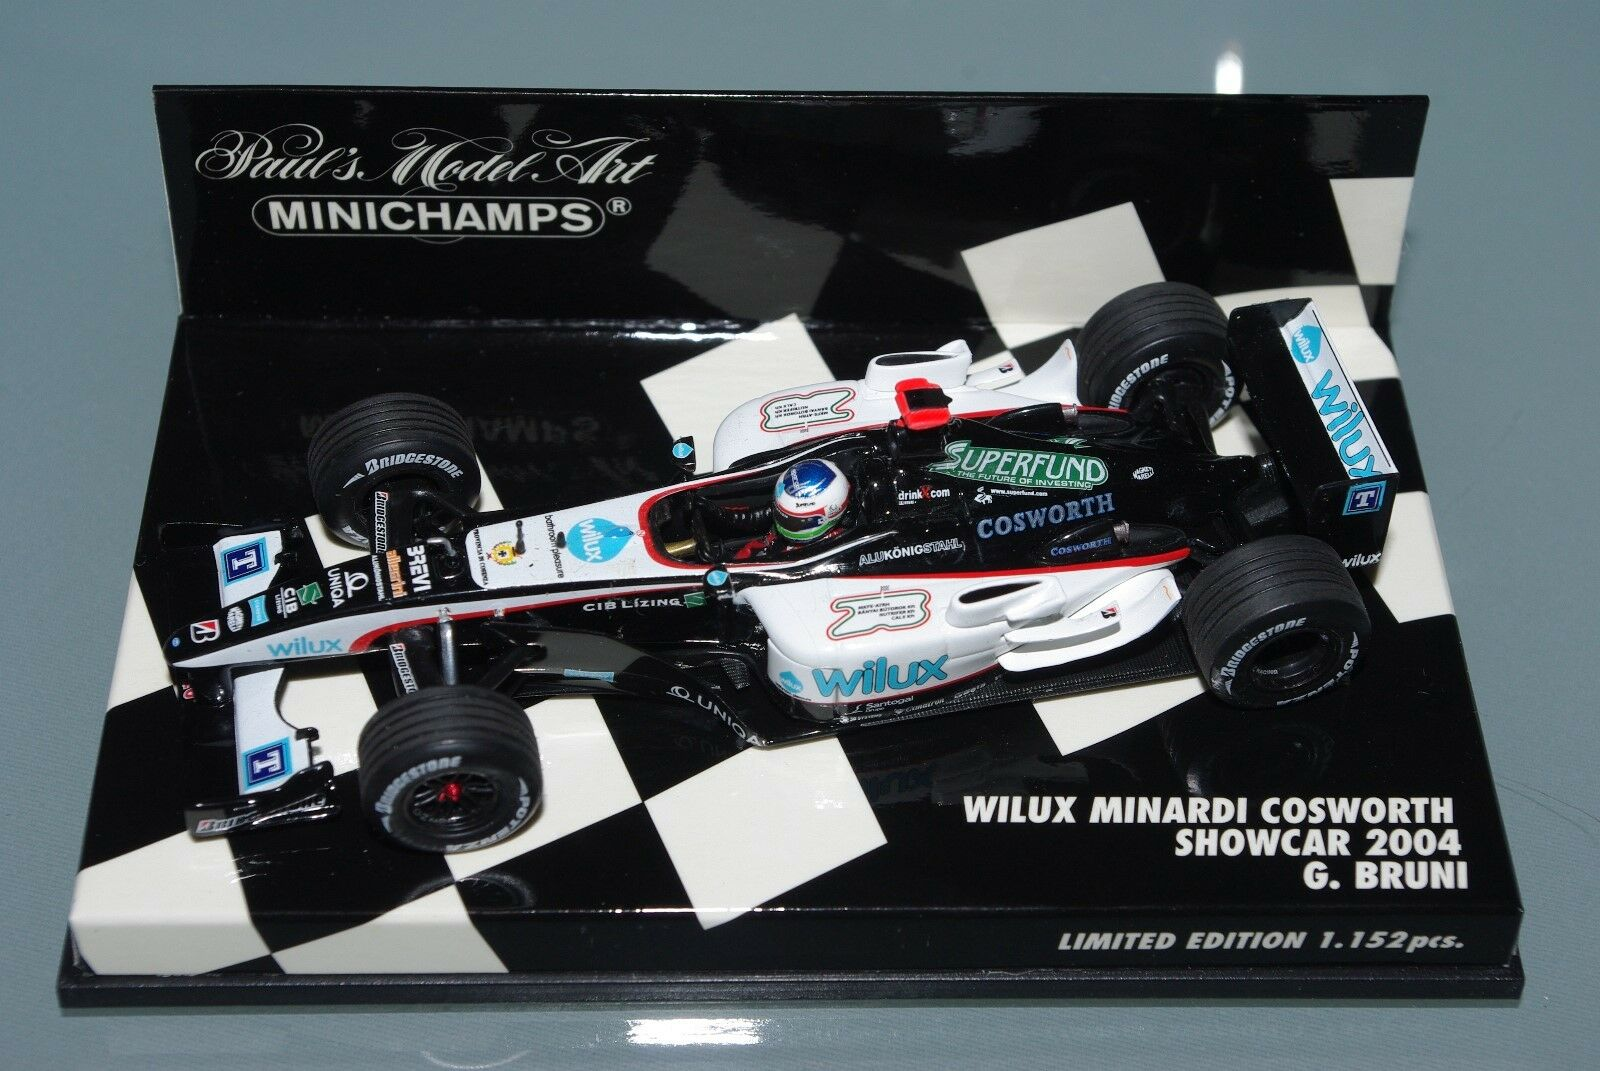 Minichamps F1 1 43 wilux Minardi Cosworth Showcar 2004-G. Bruni